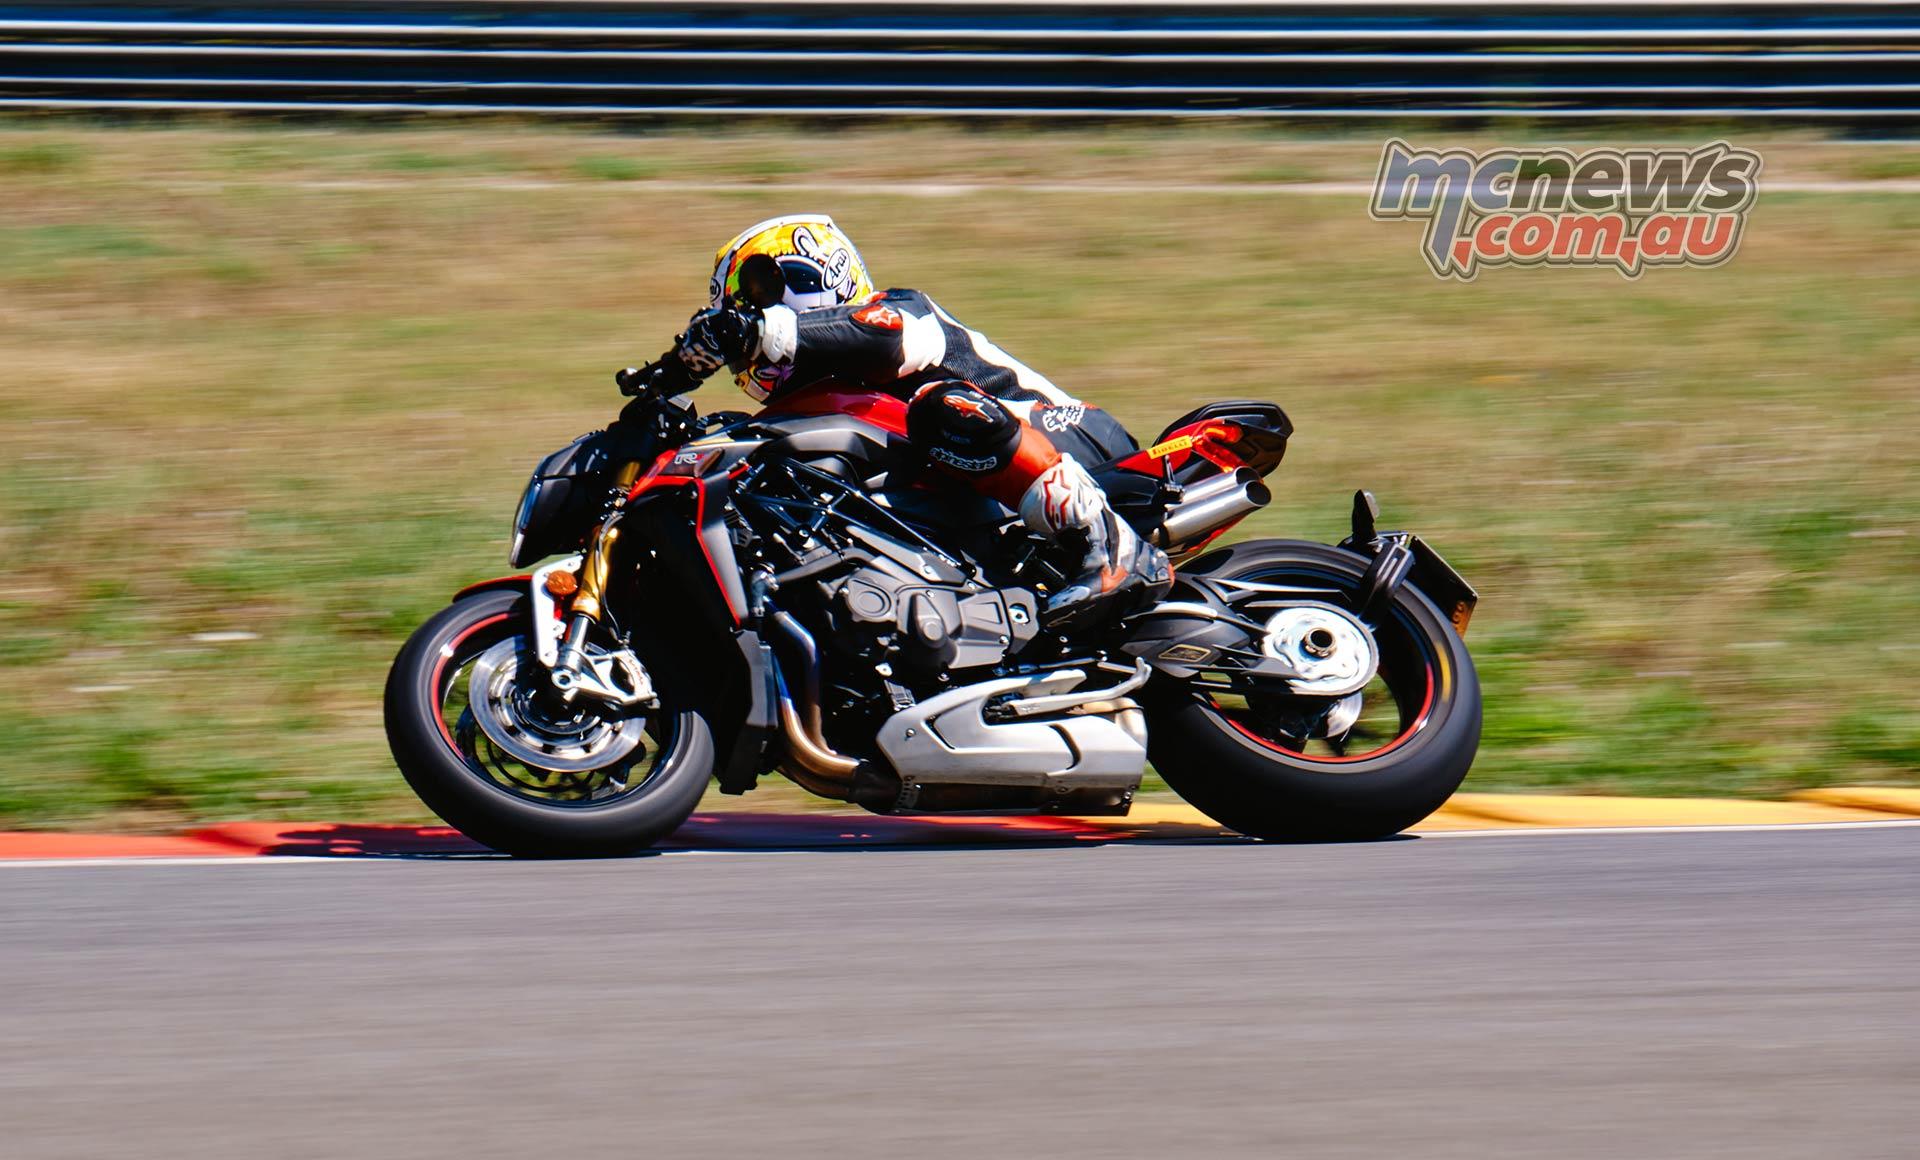 MV Agusta Brutale 1000 RR at the racetrack